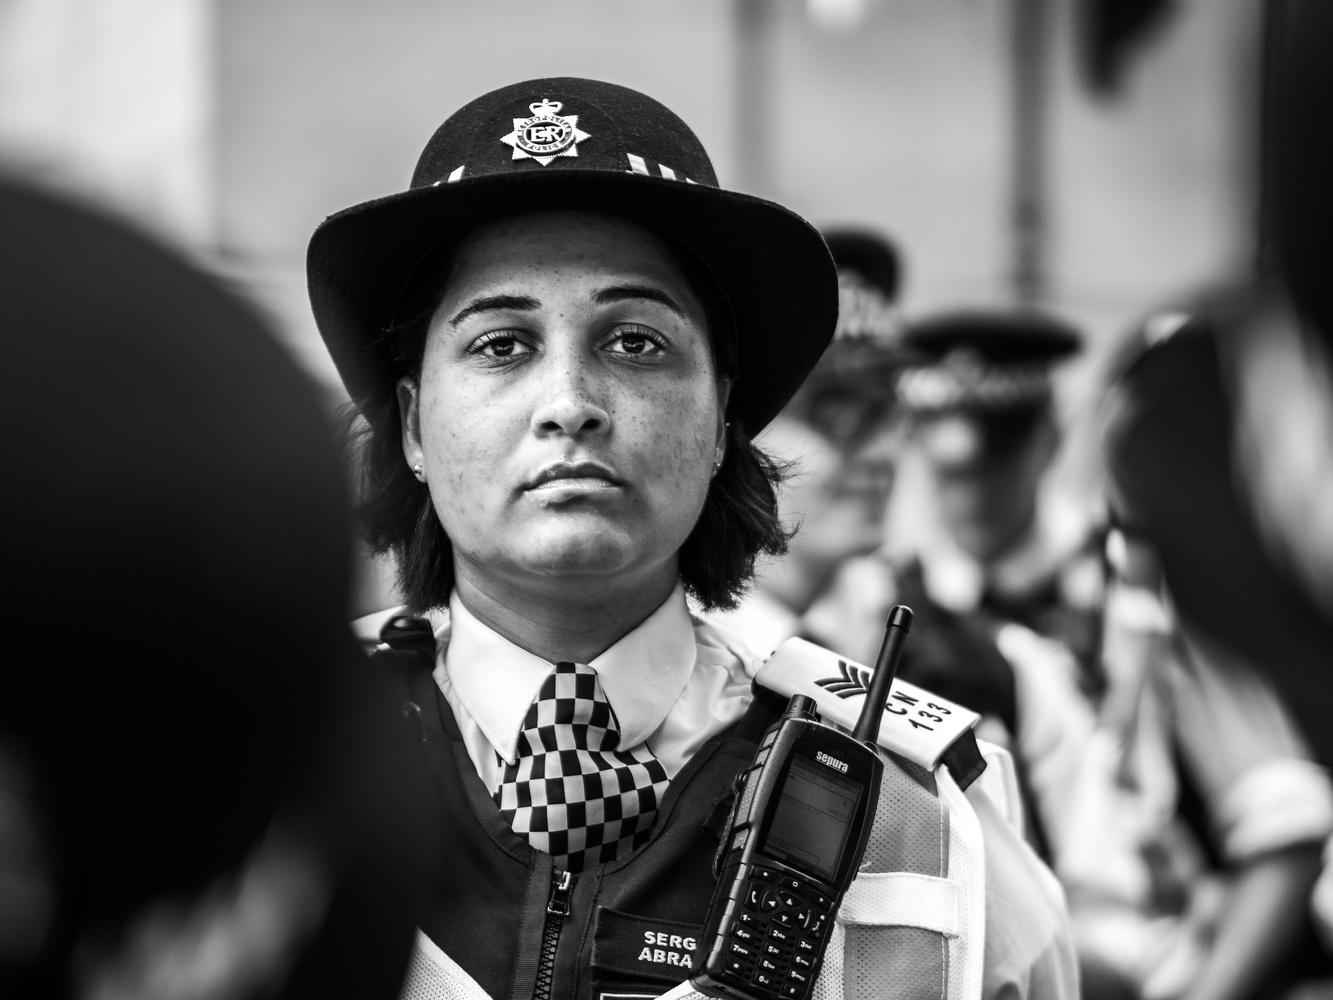 London Cops by tomas doe